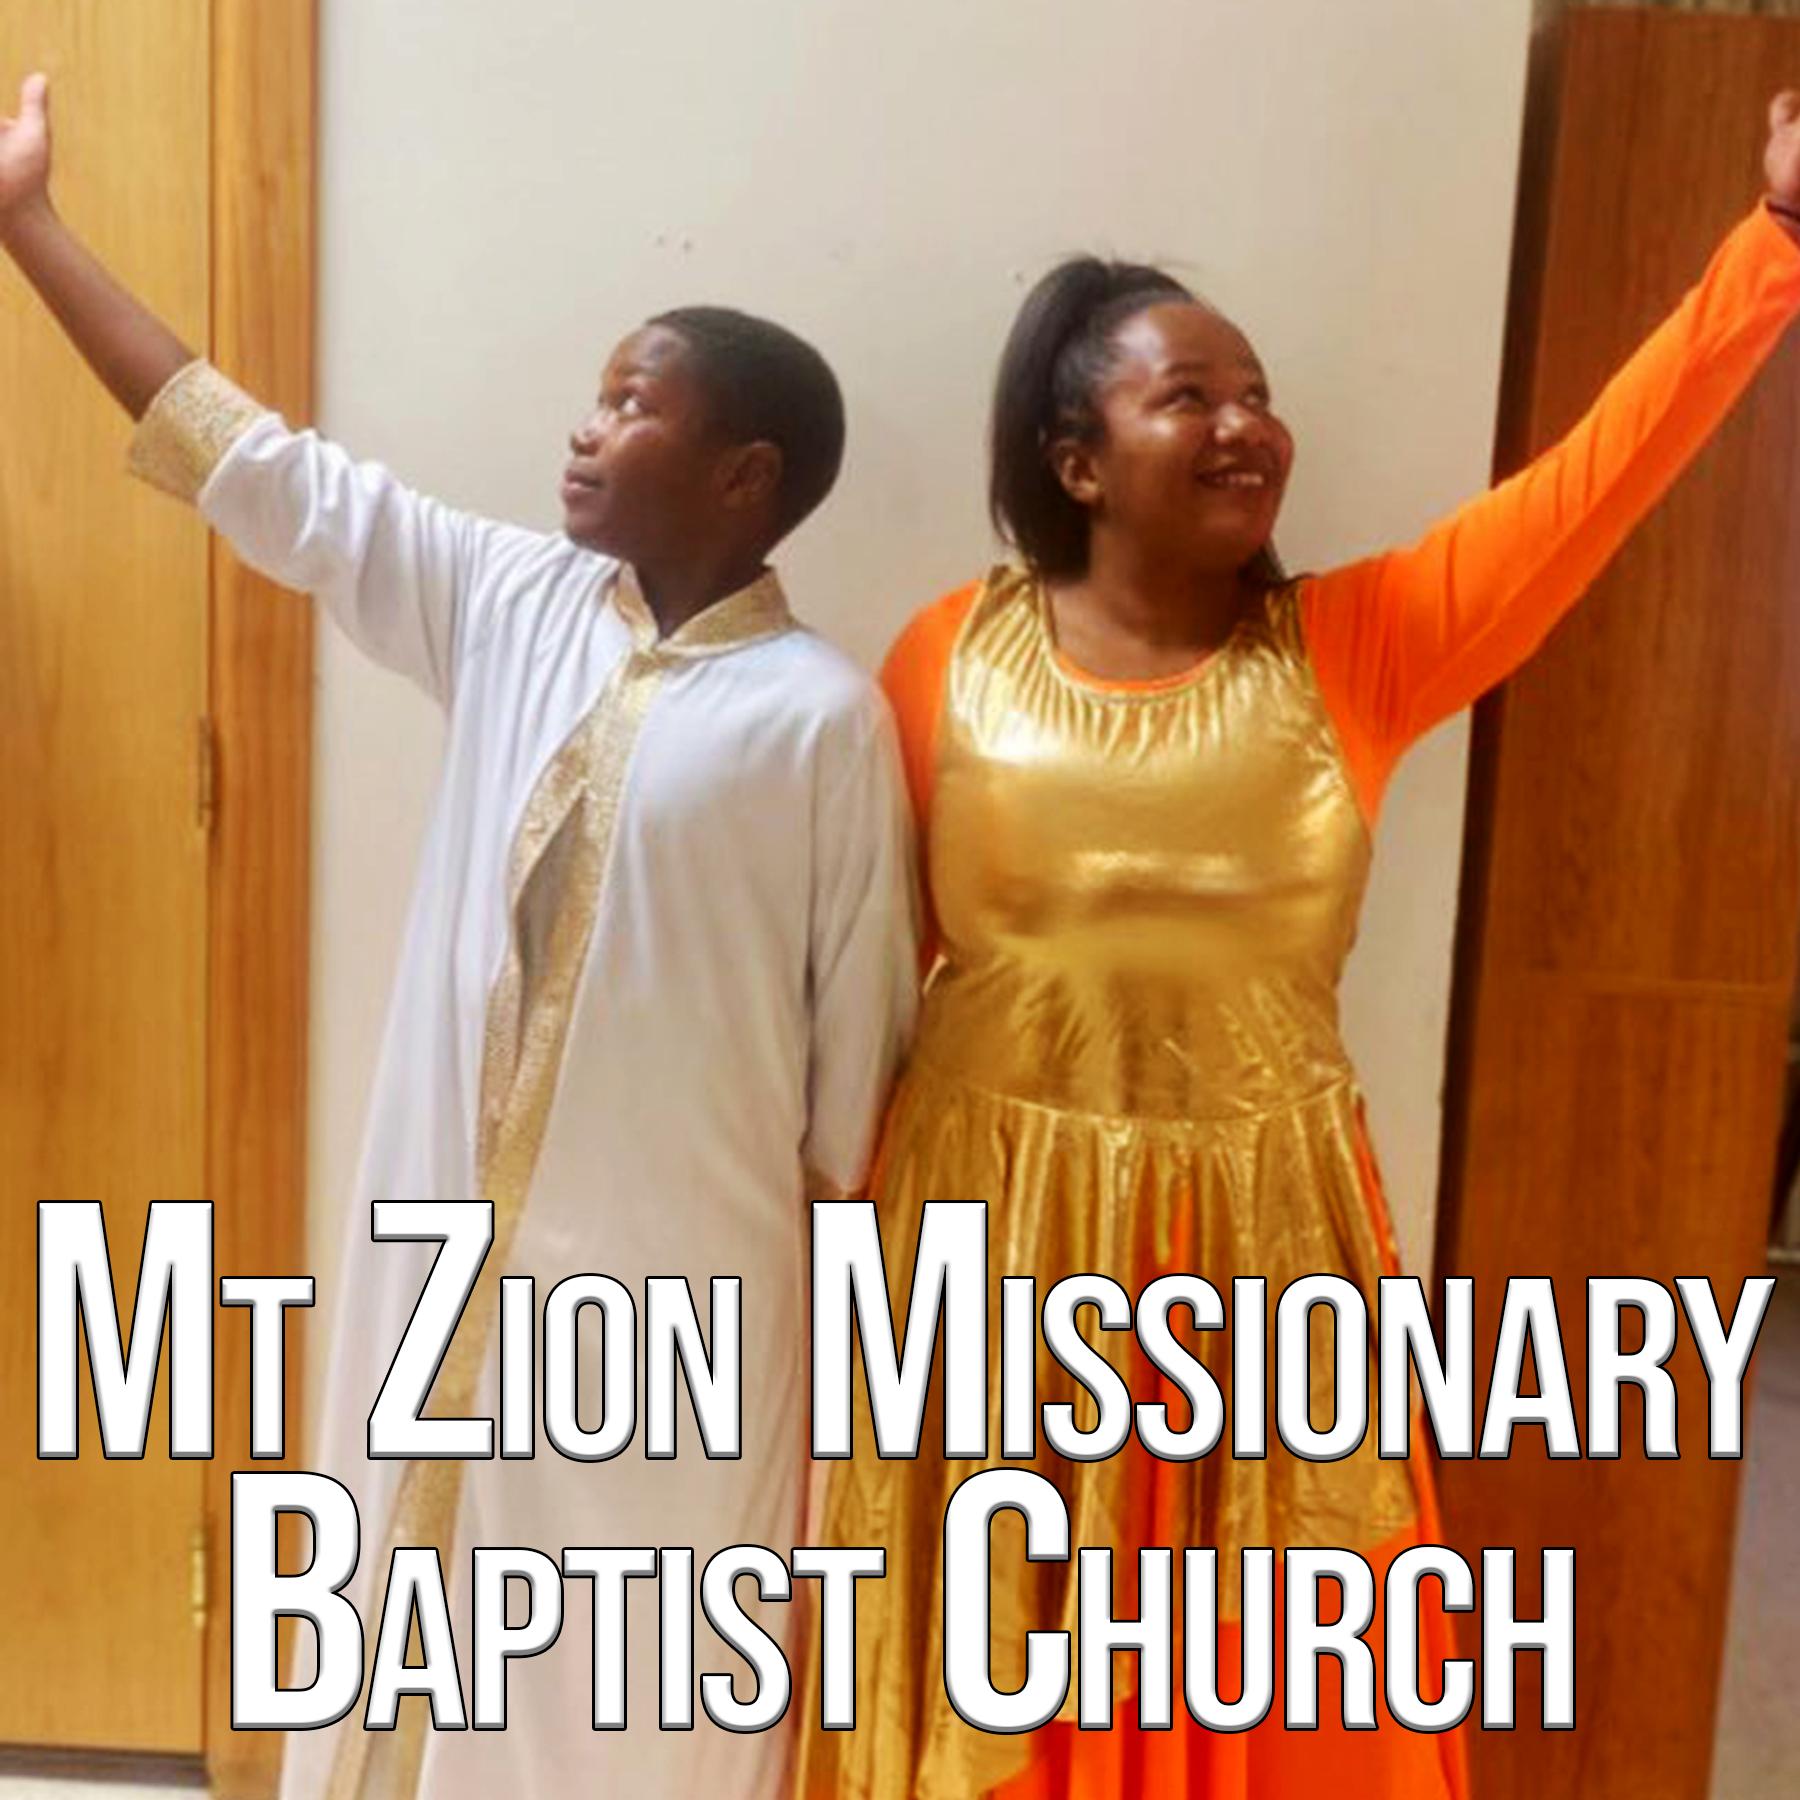 Mount-Zion-Missionary-Baptist-Church-Jesus-Fest-WV